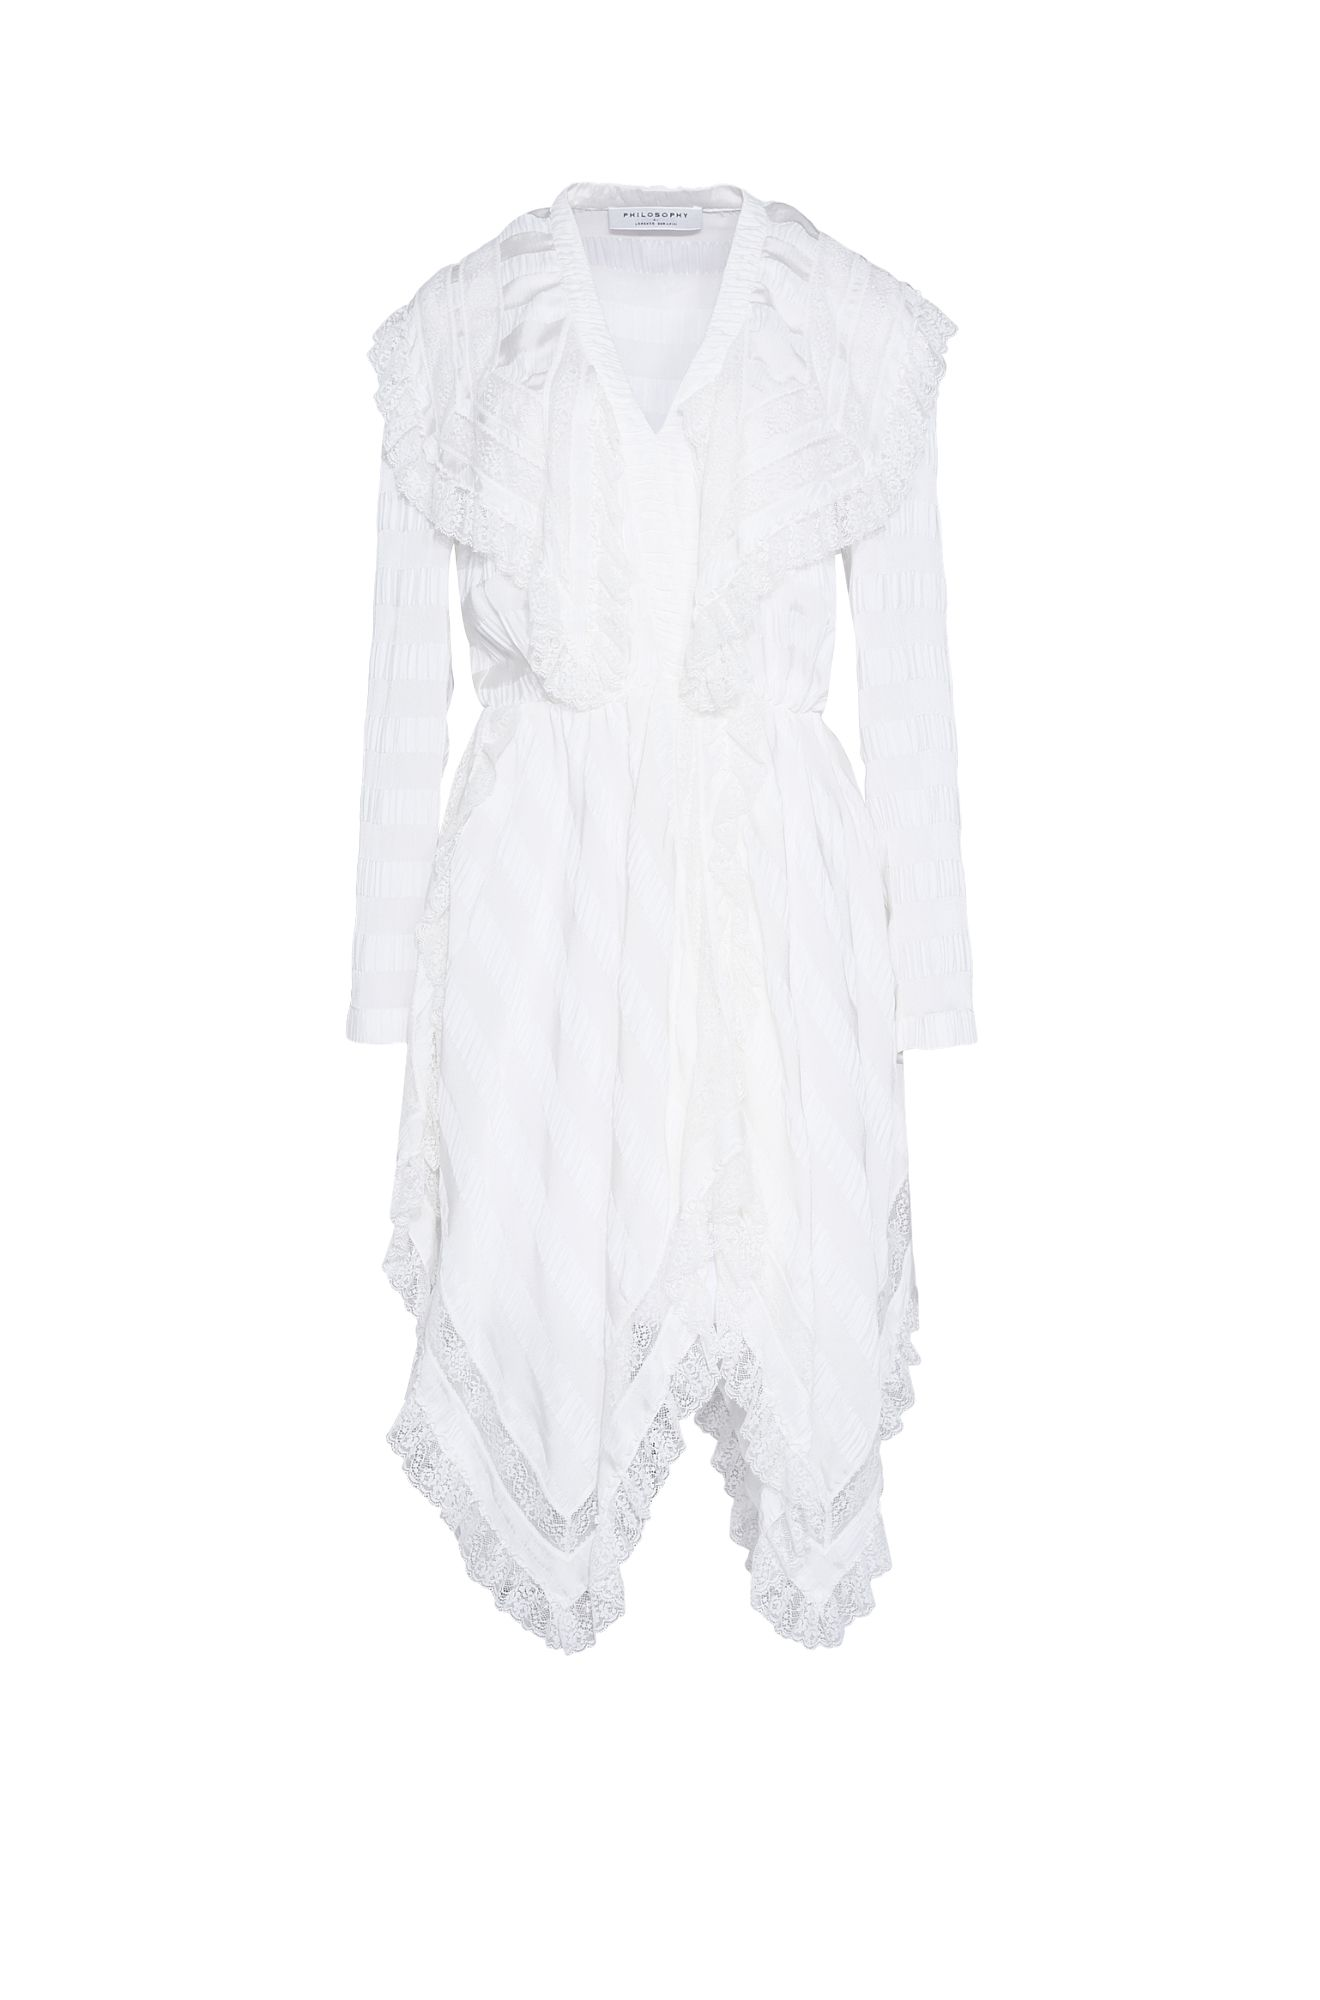 CORSAIR WHITE DRESS